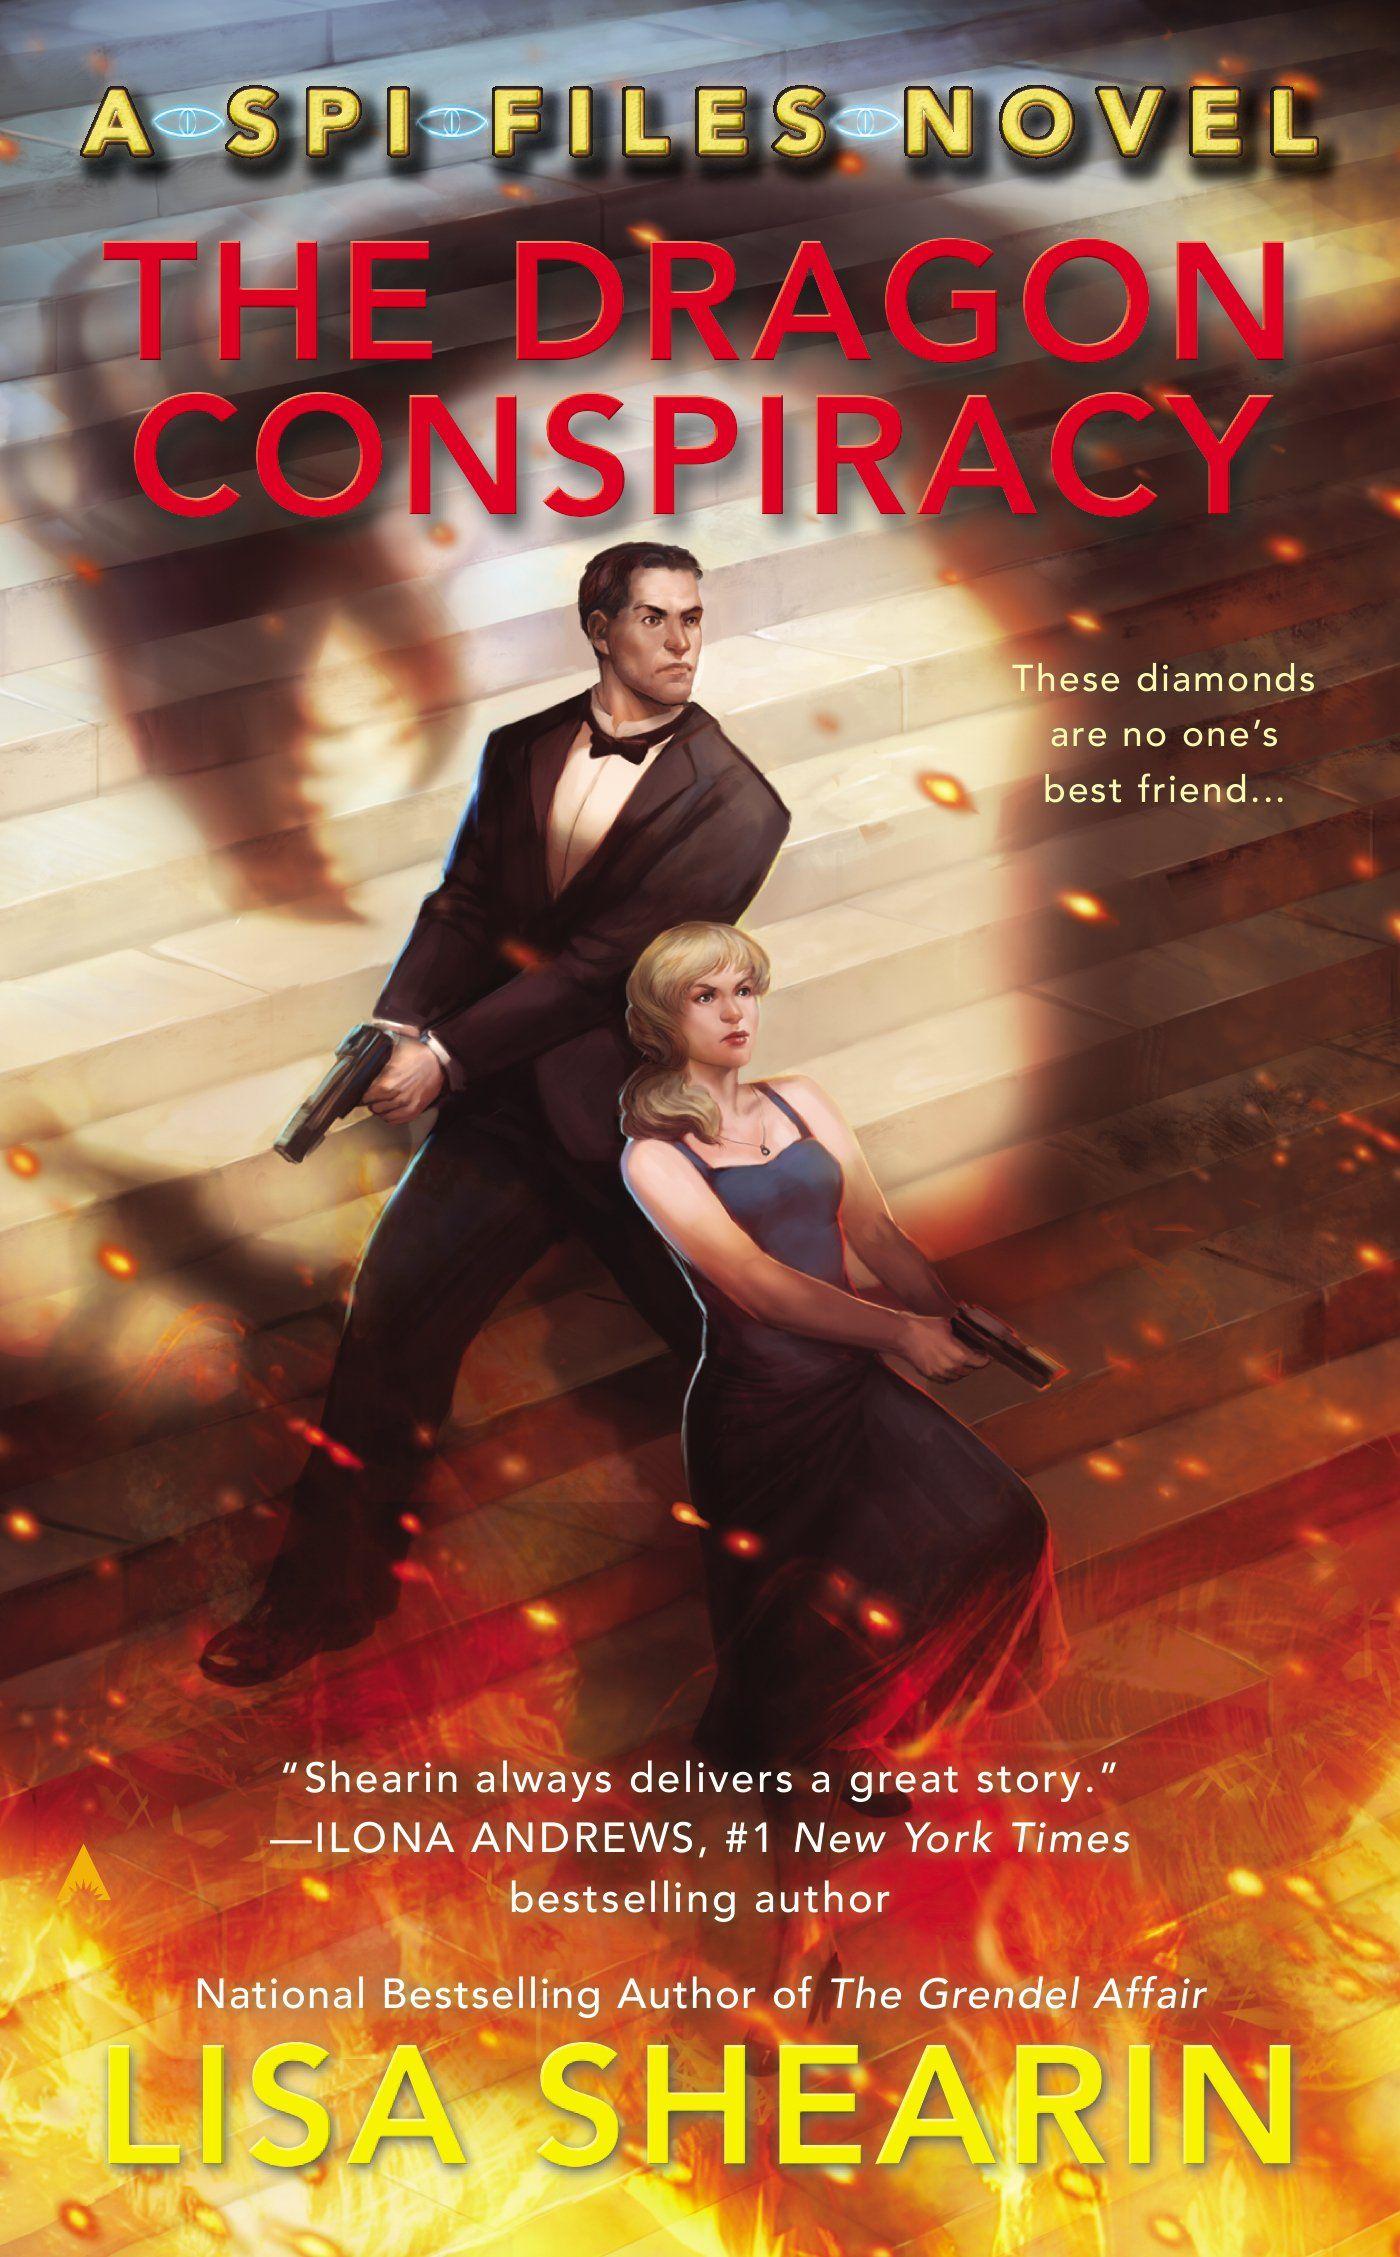 The Dragon Conspiracy (SPI Files #2) by Lisa Shearin | January 27, 2015 | Ace